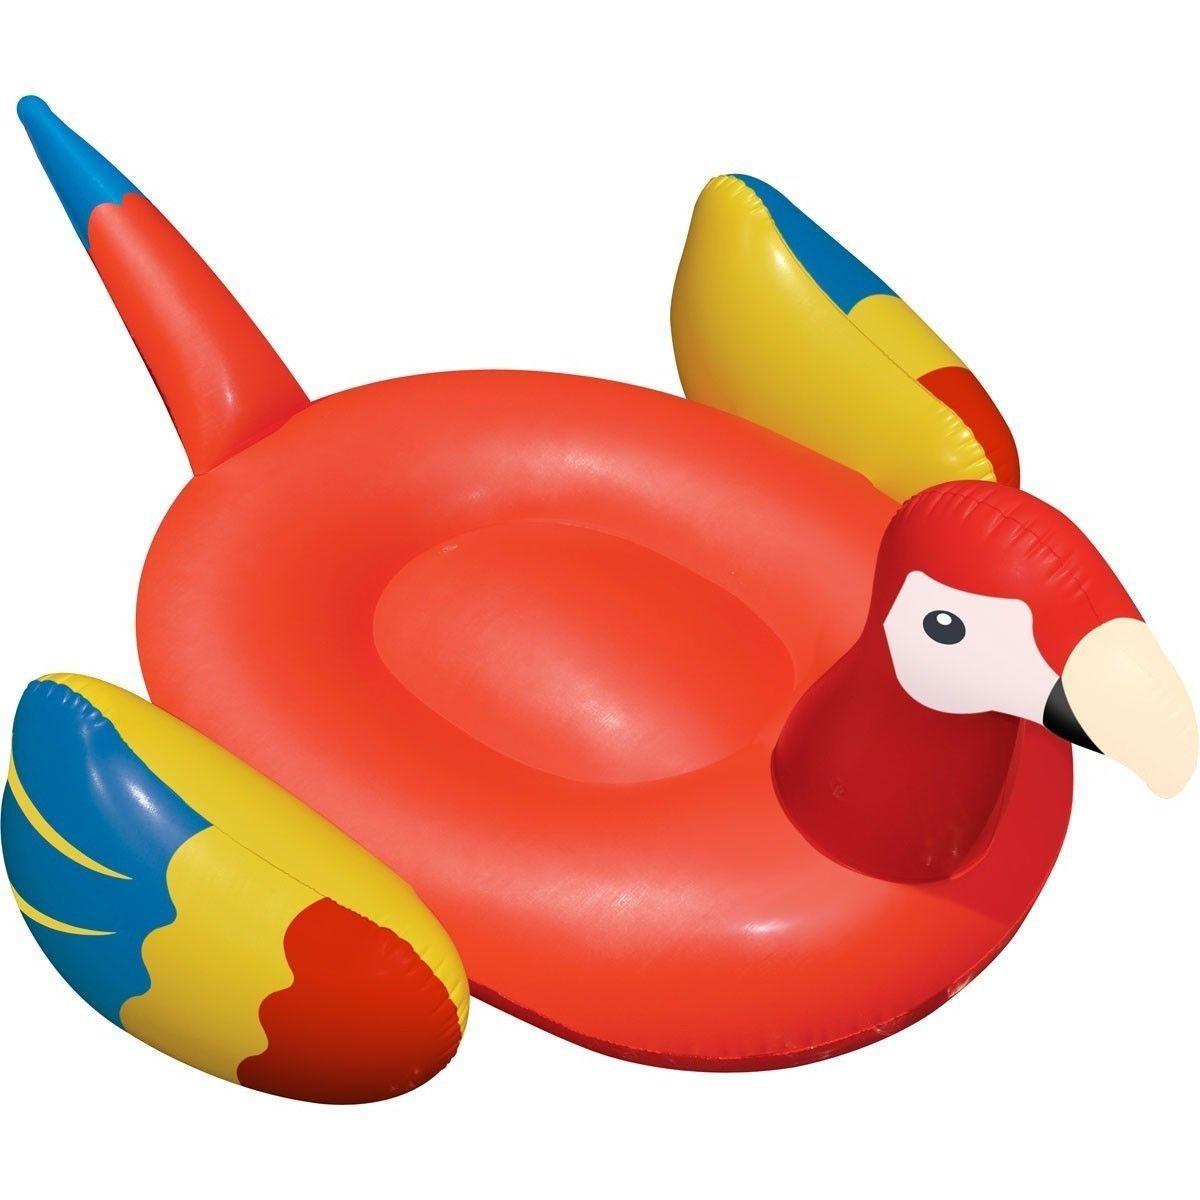 Swimline Giant Parrot Inflatable Float